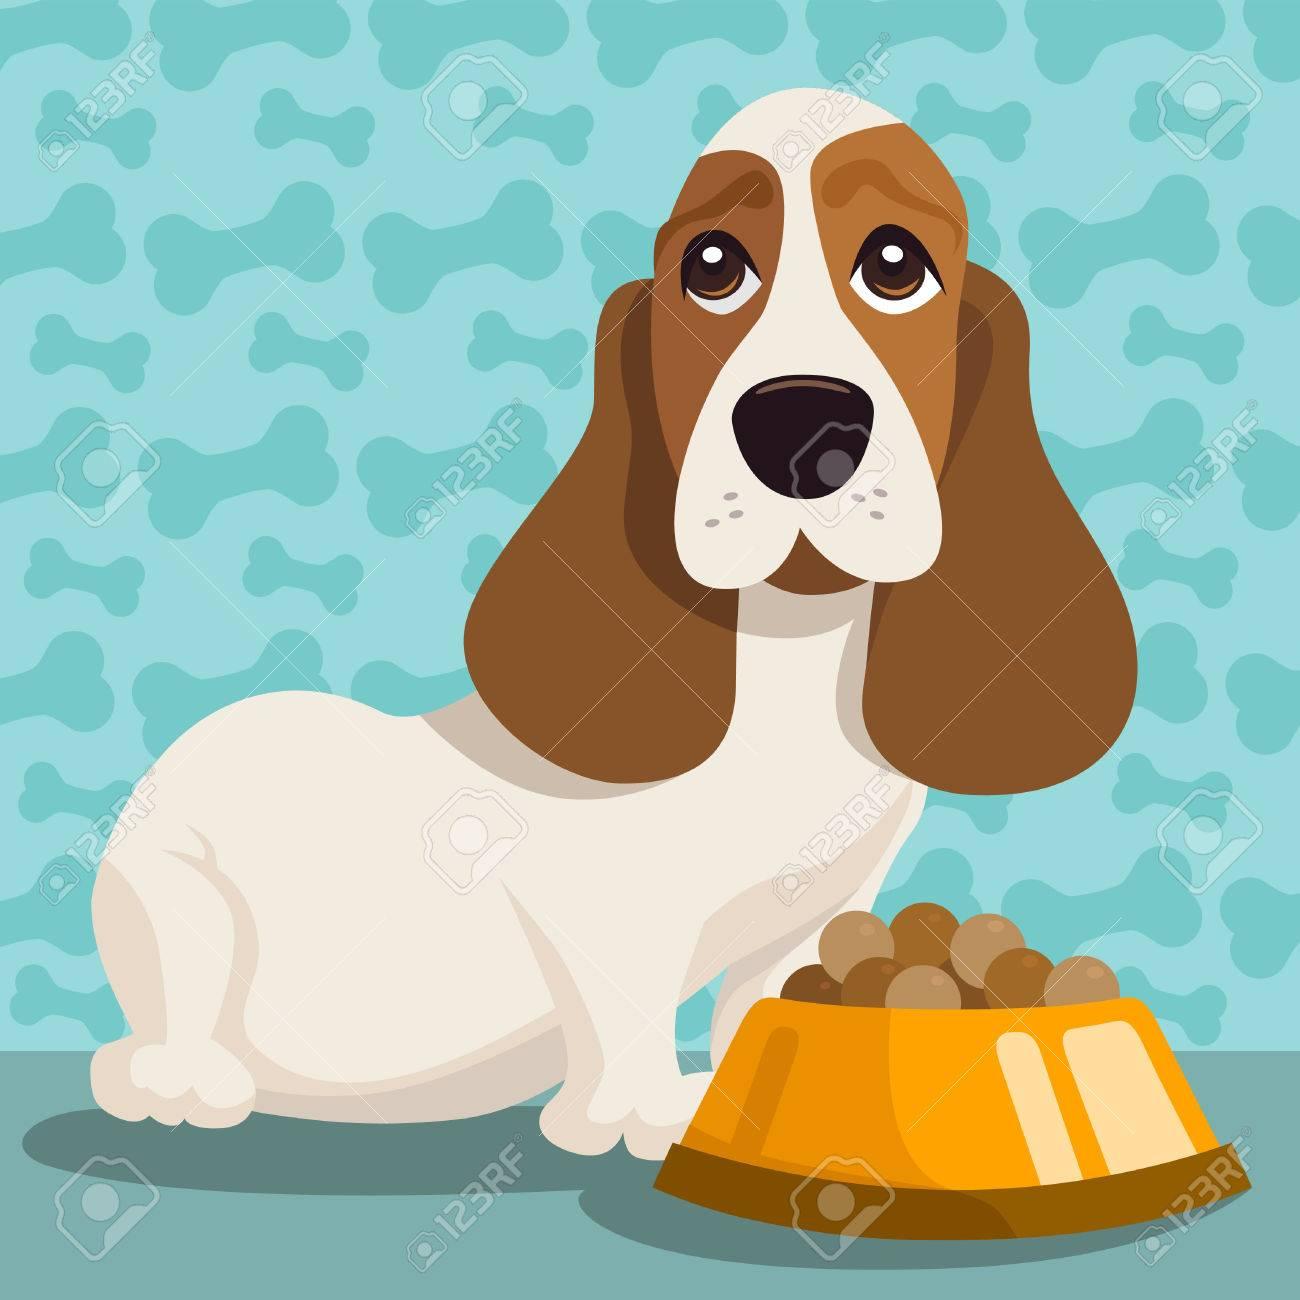 dog illustration Stock Vector - 8352841